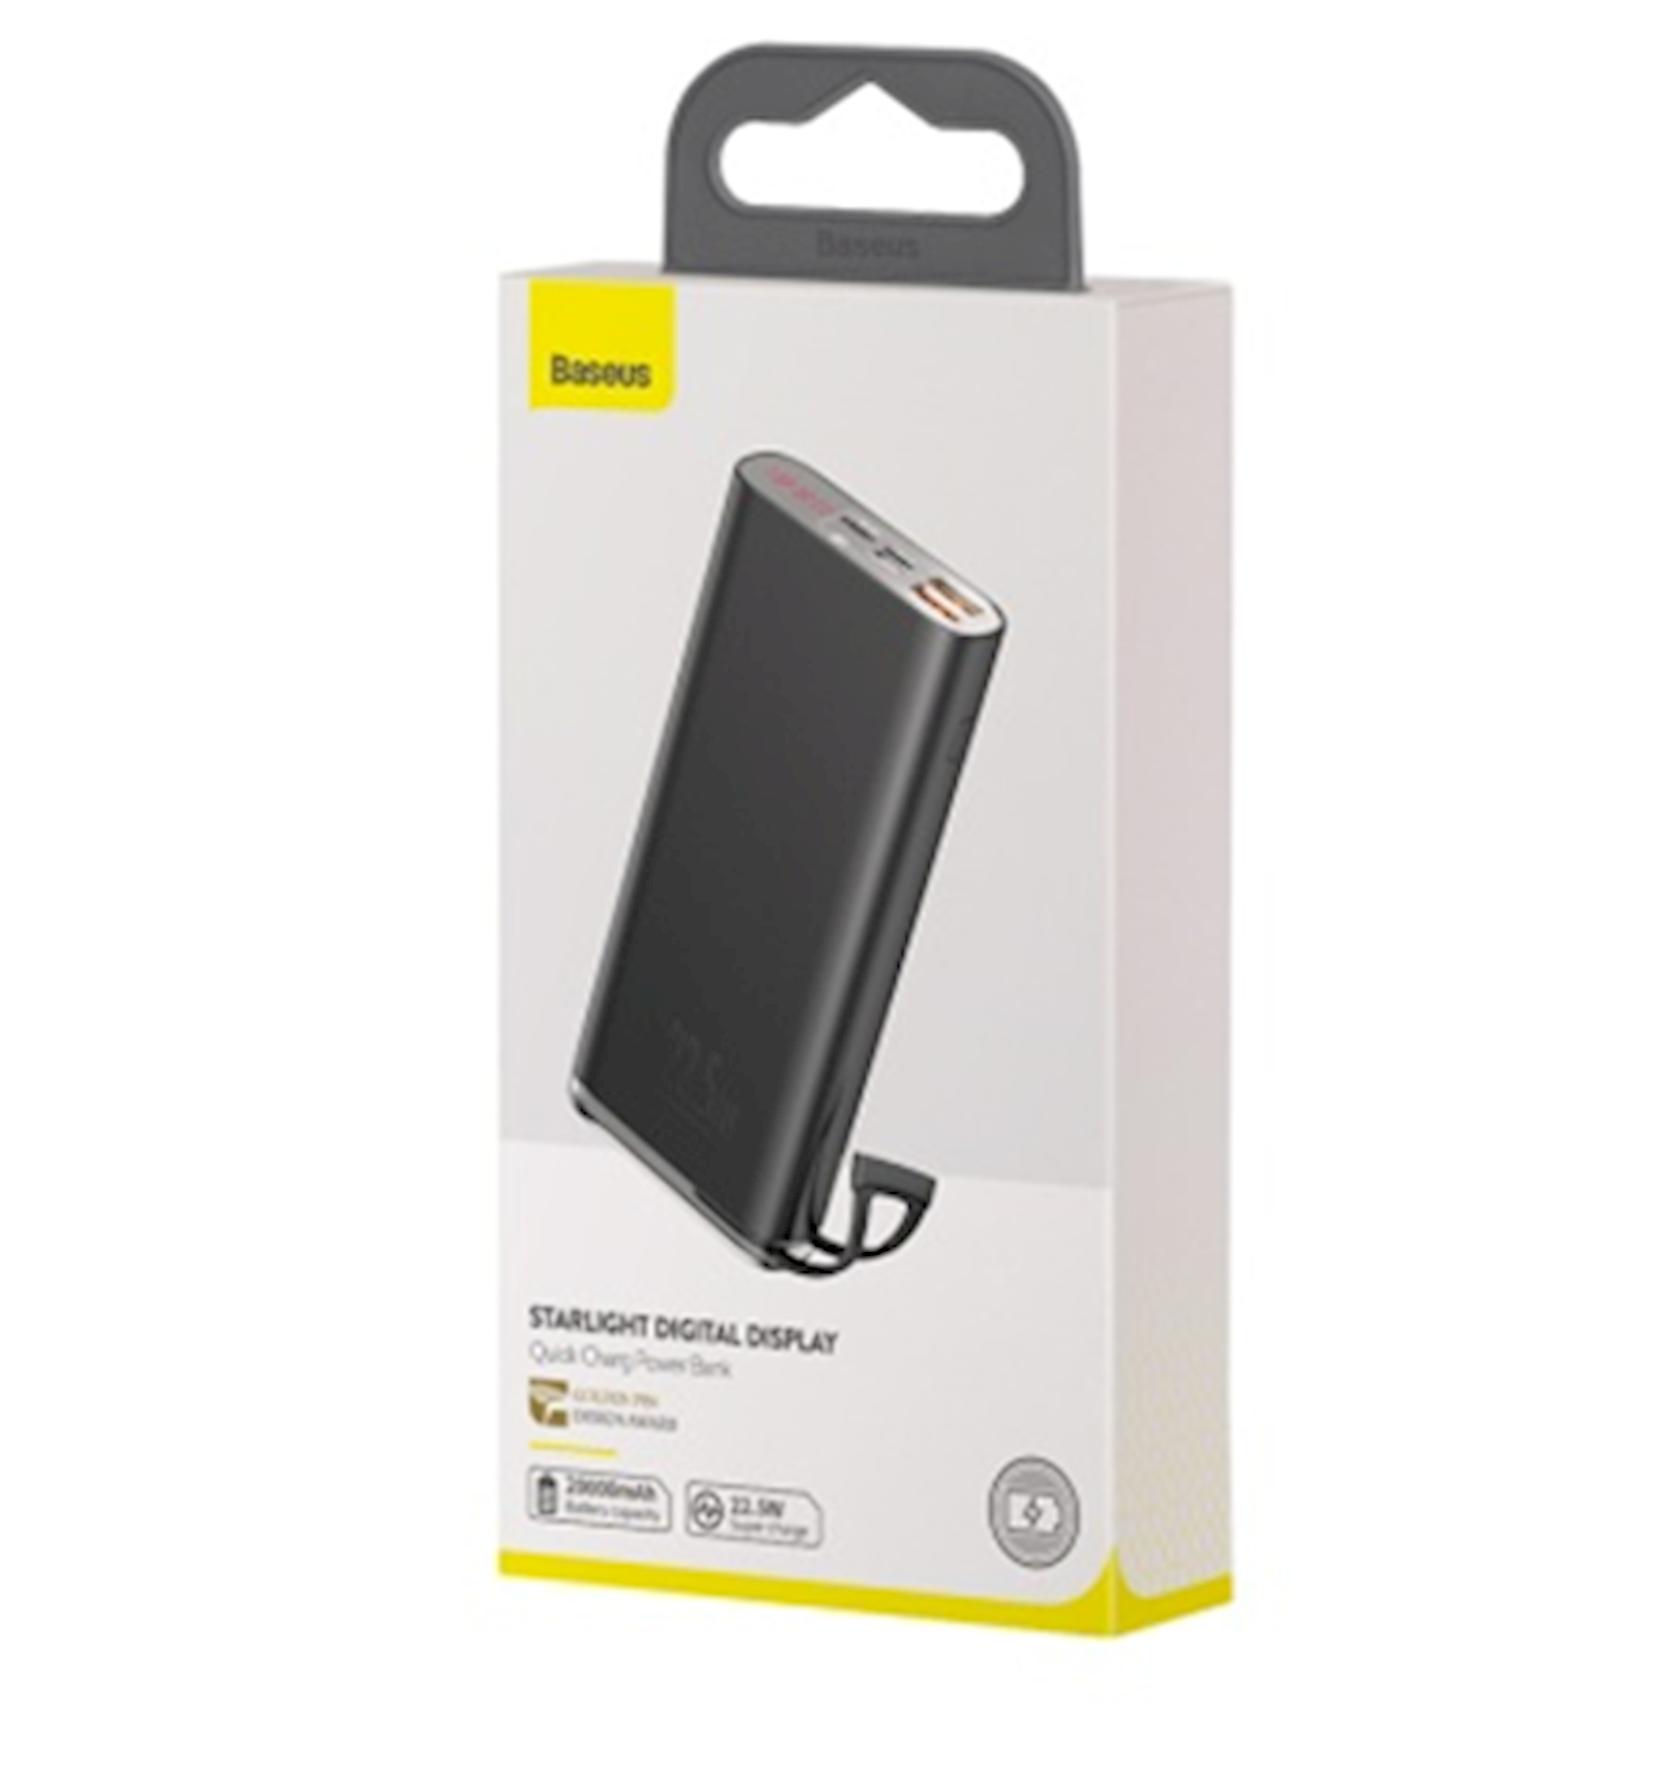 Powerbank Baseus Starlight Digital Display Quick Charge   20000mAh 22.5W PPXC-01